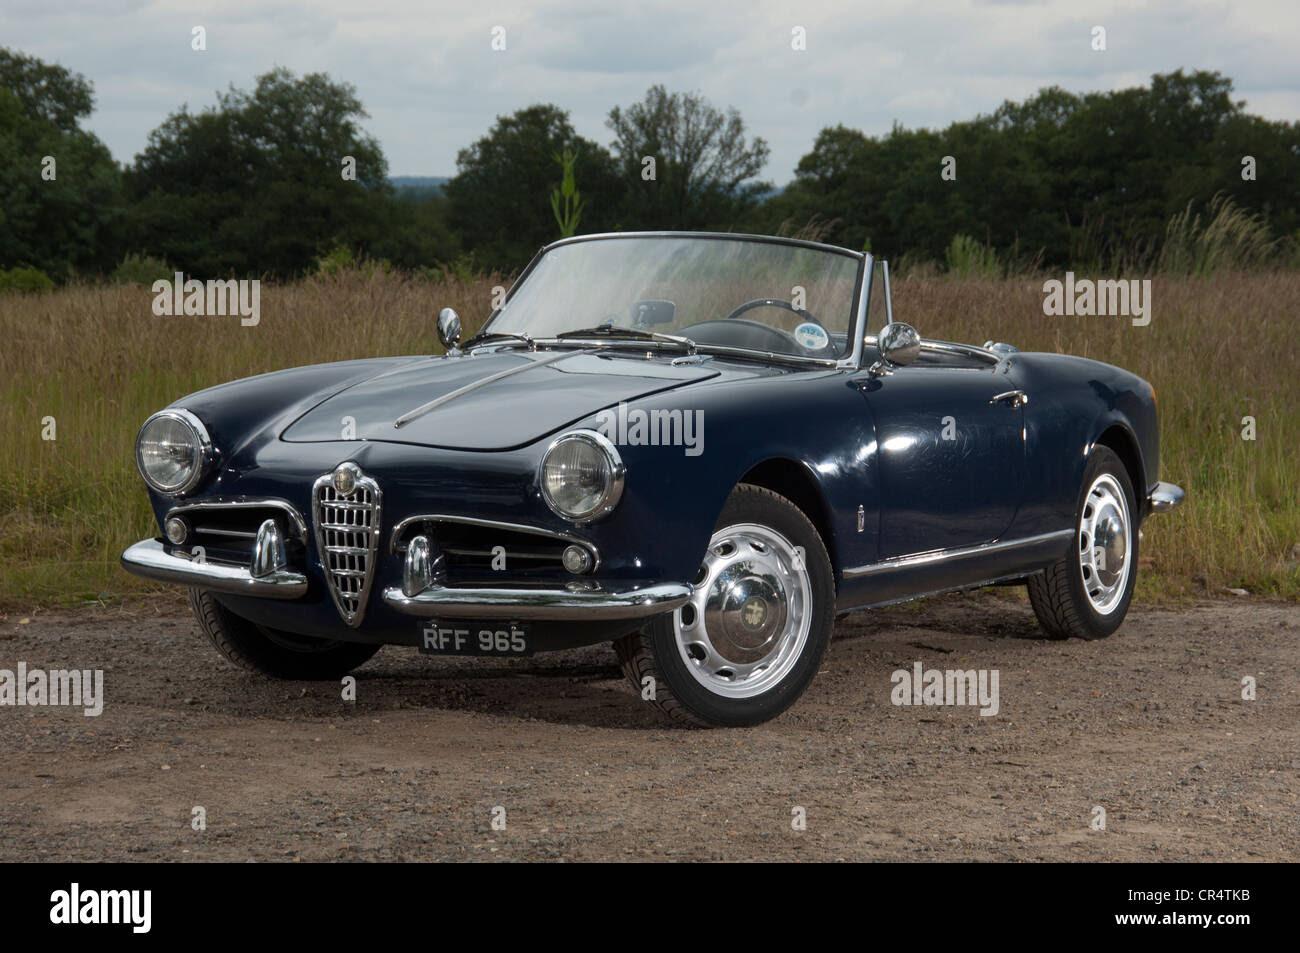 Alfa Romeo Giulietta Spider convertible Italian sports car Stock Photo, Royalty Free Image